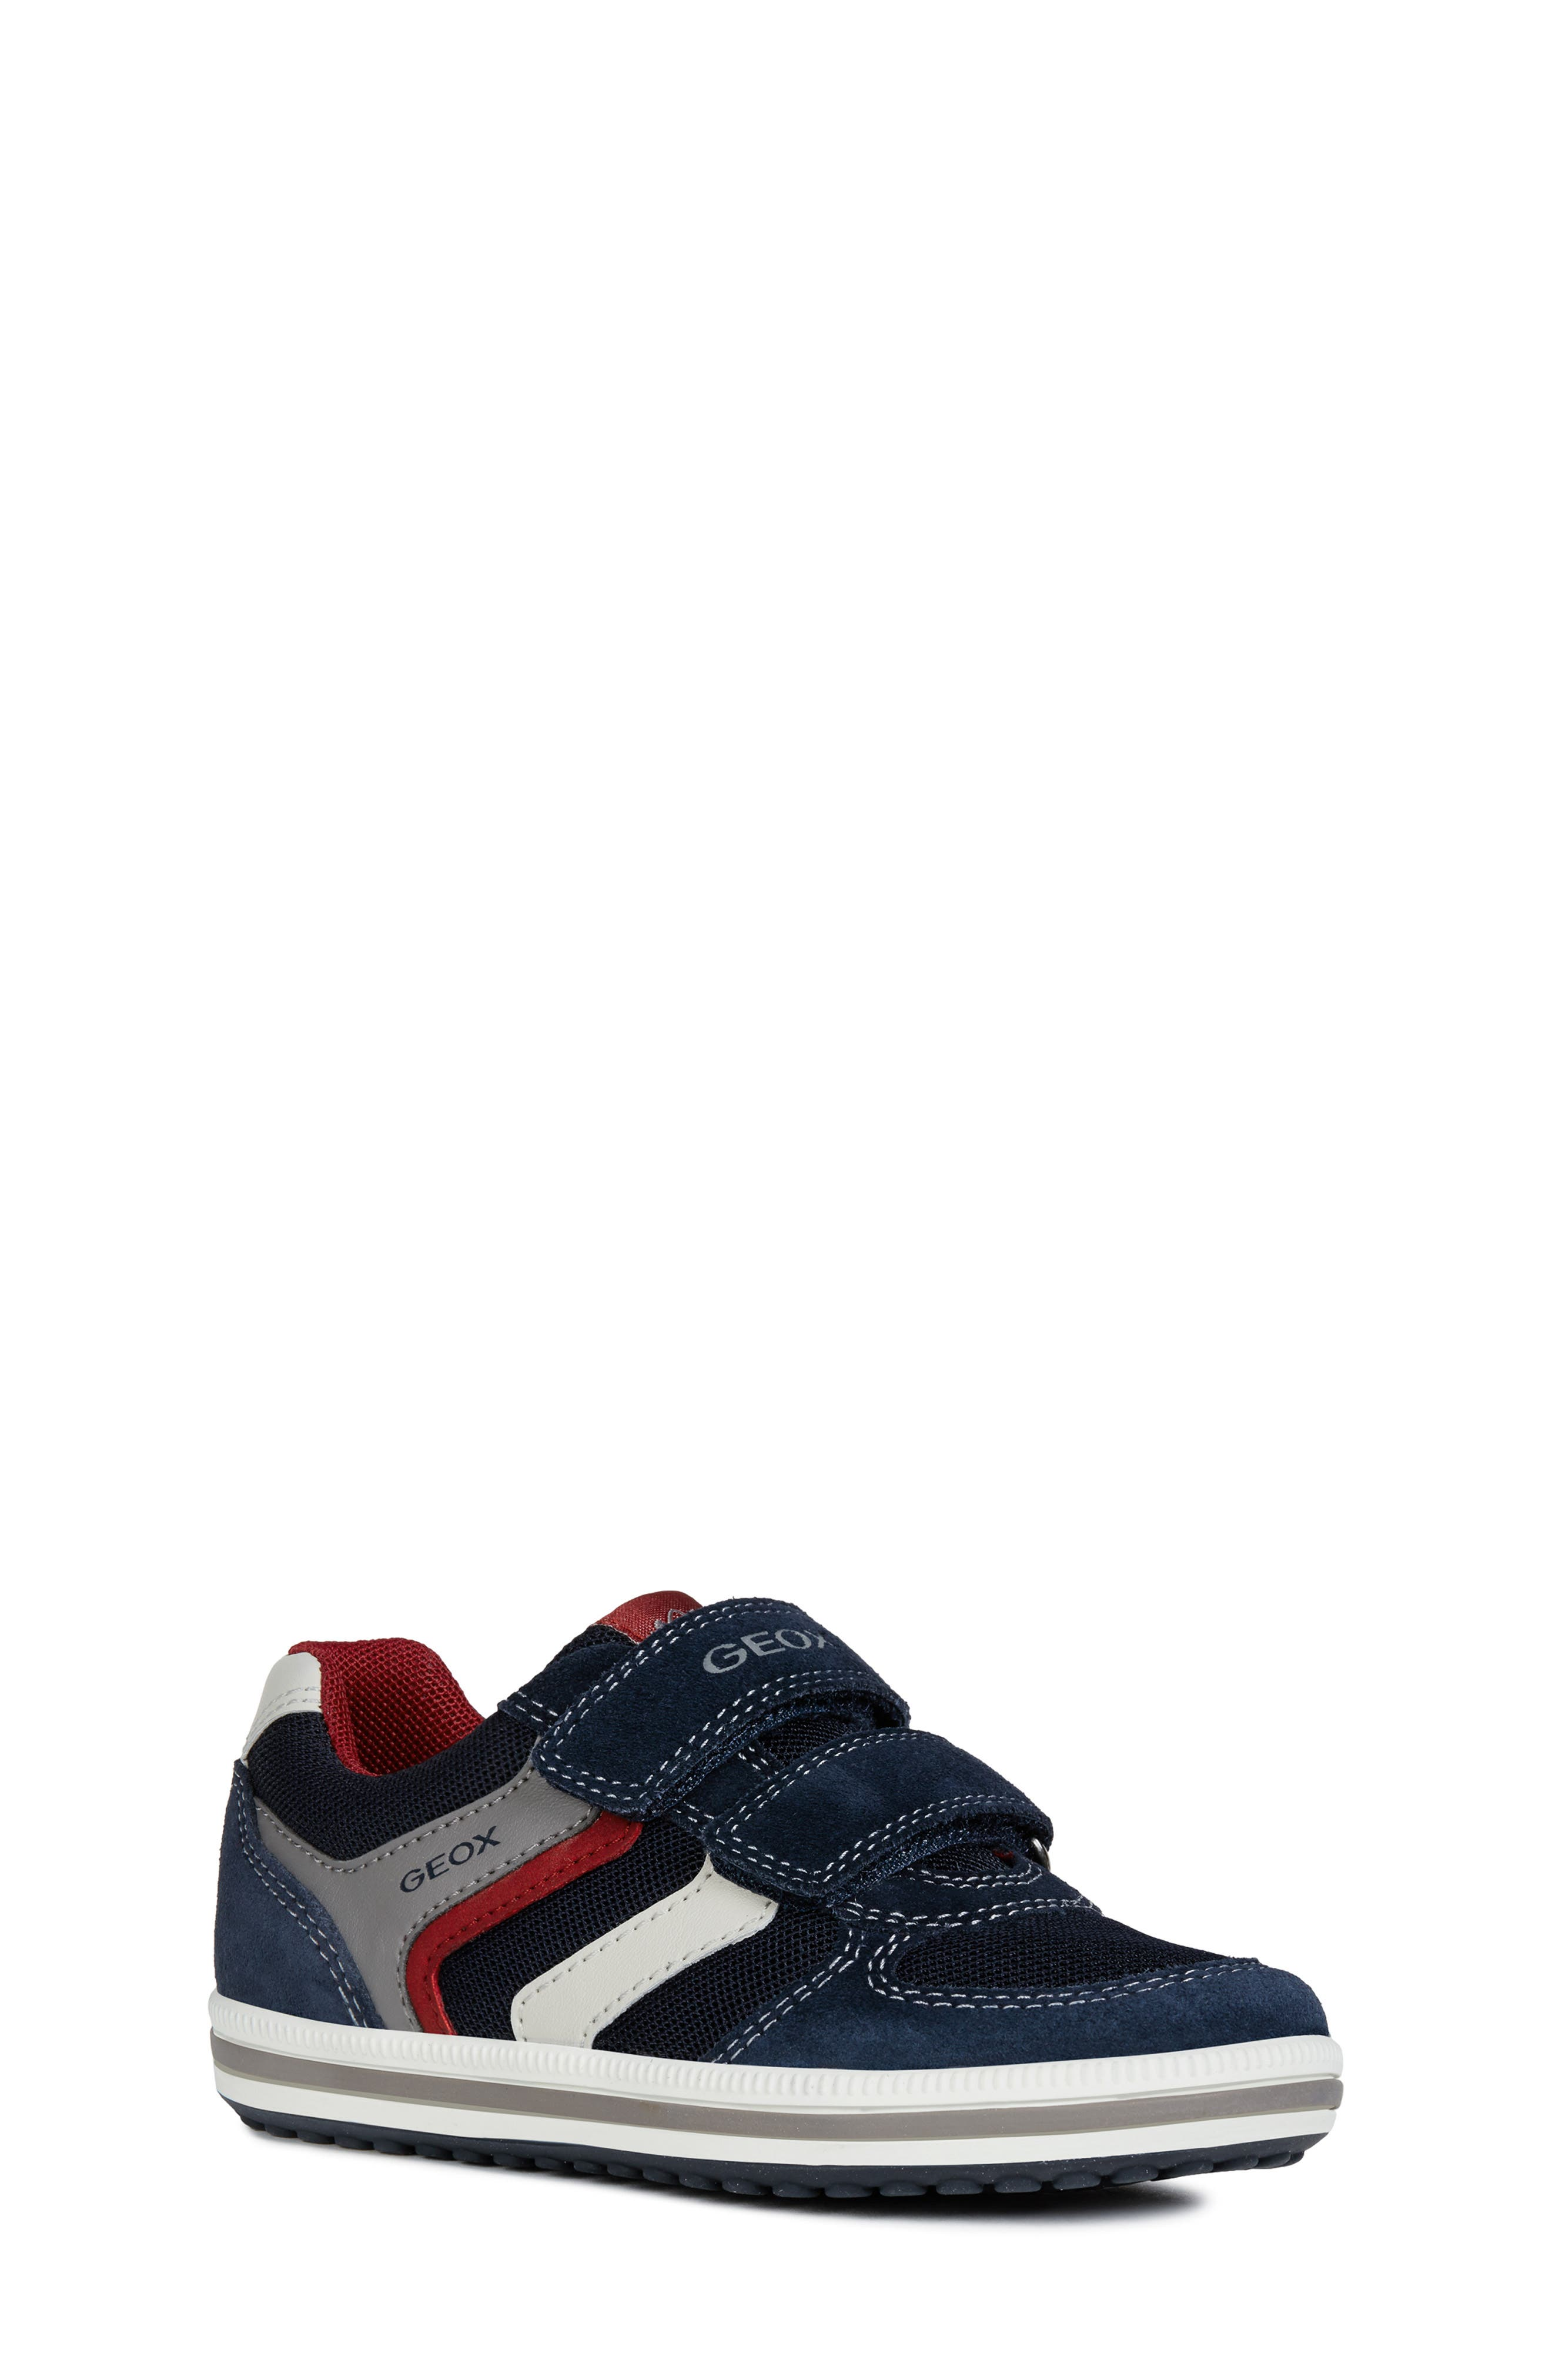 GEOX, 'Vita' Sneaker, Main thumbnail 1, color, NAVY/ RED